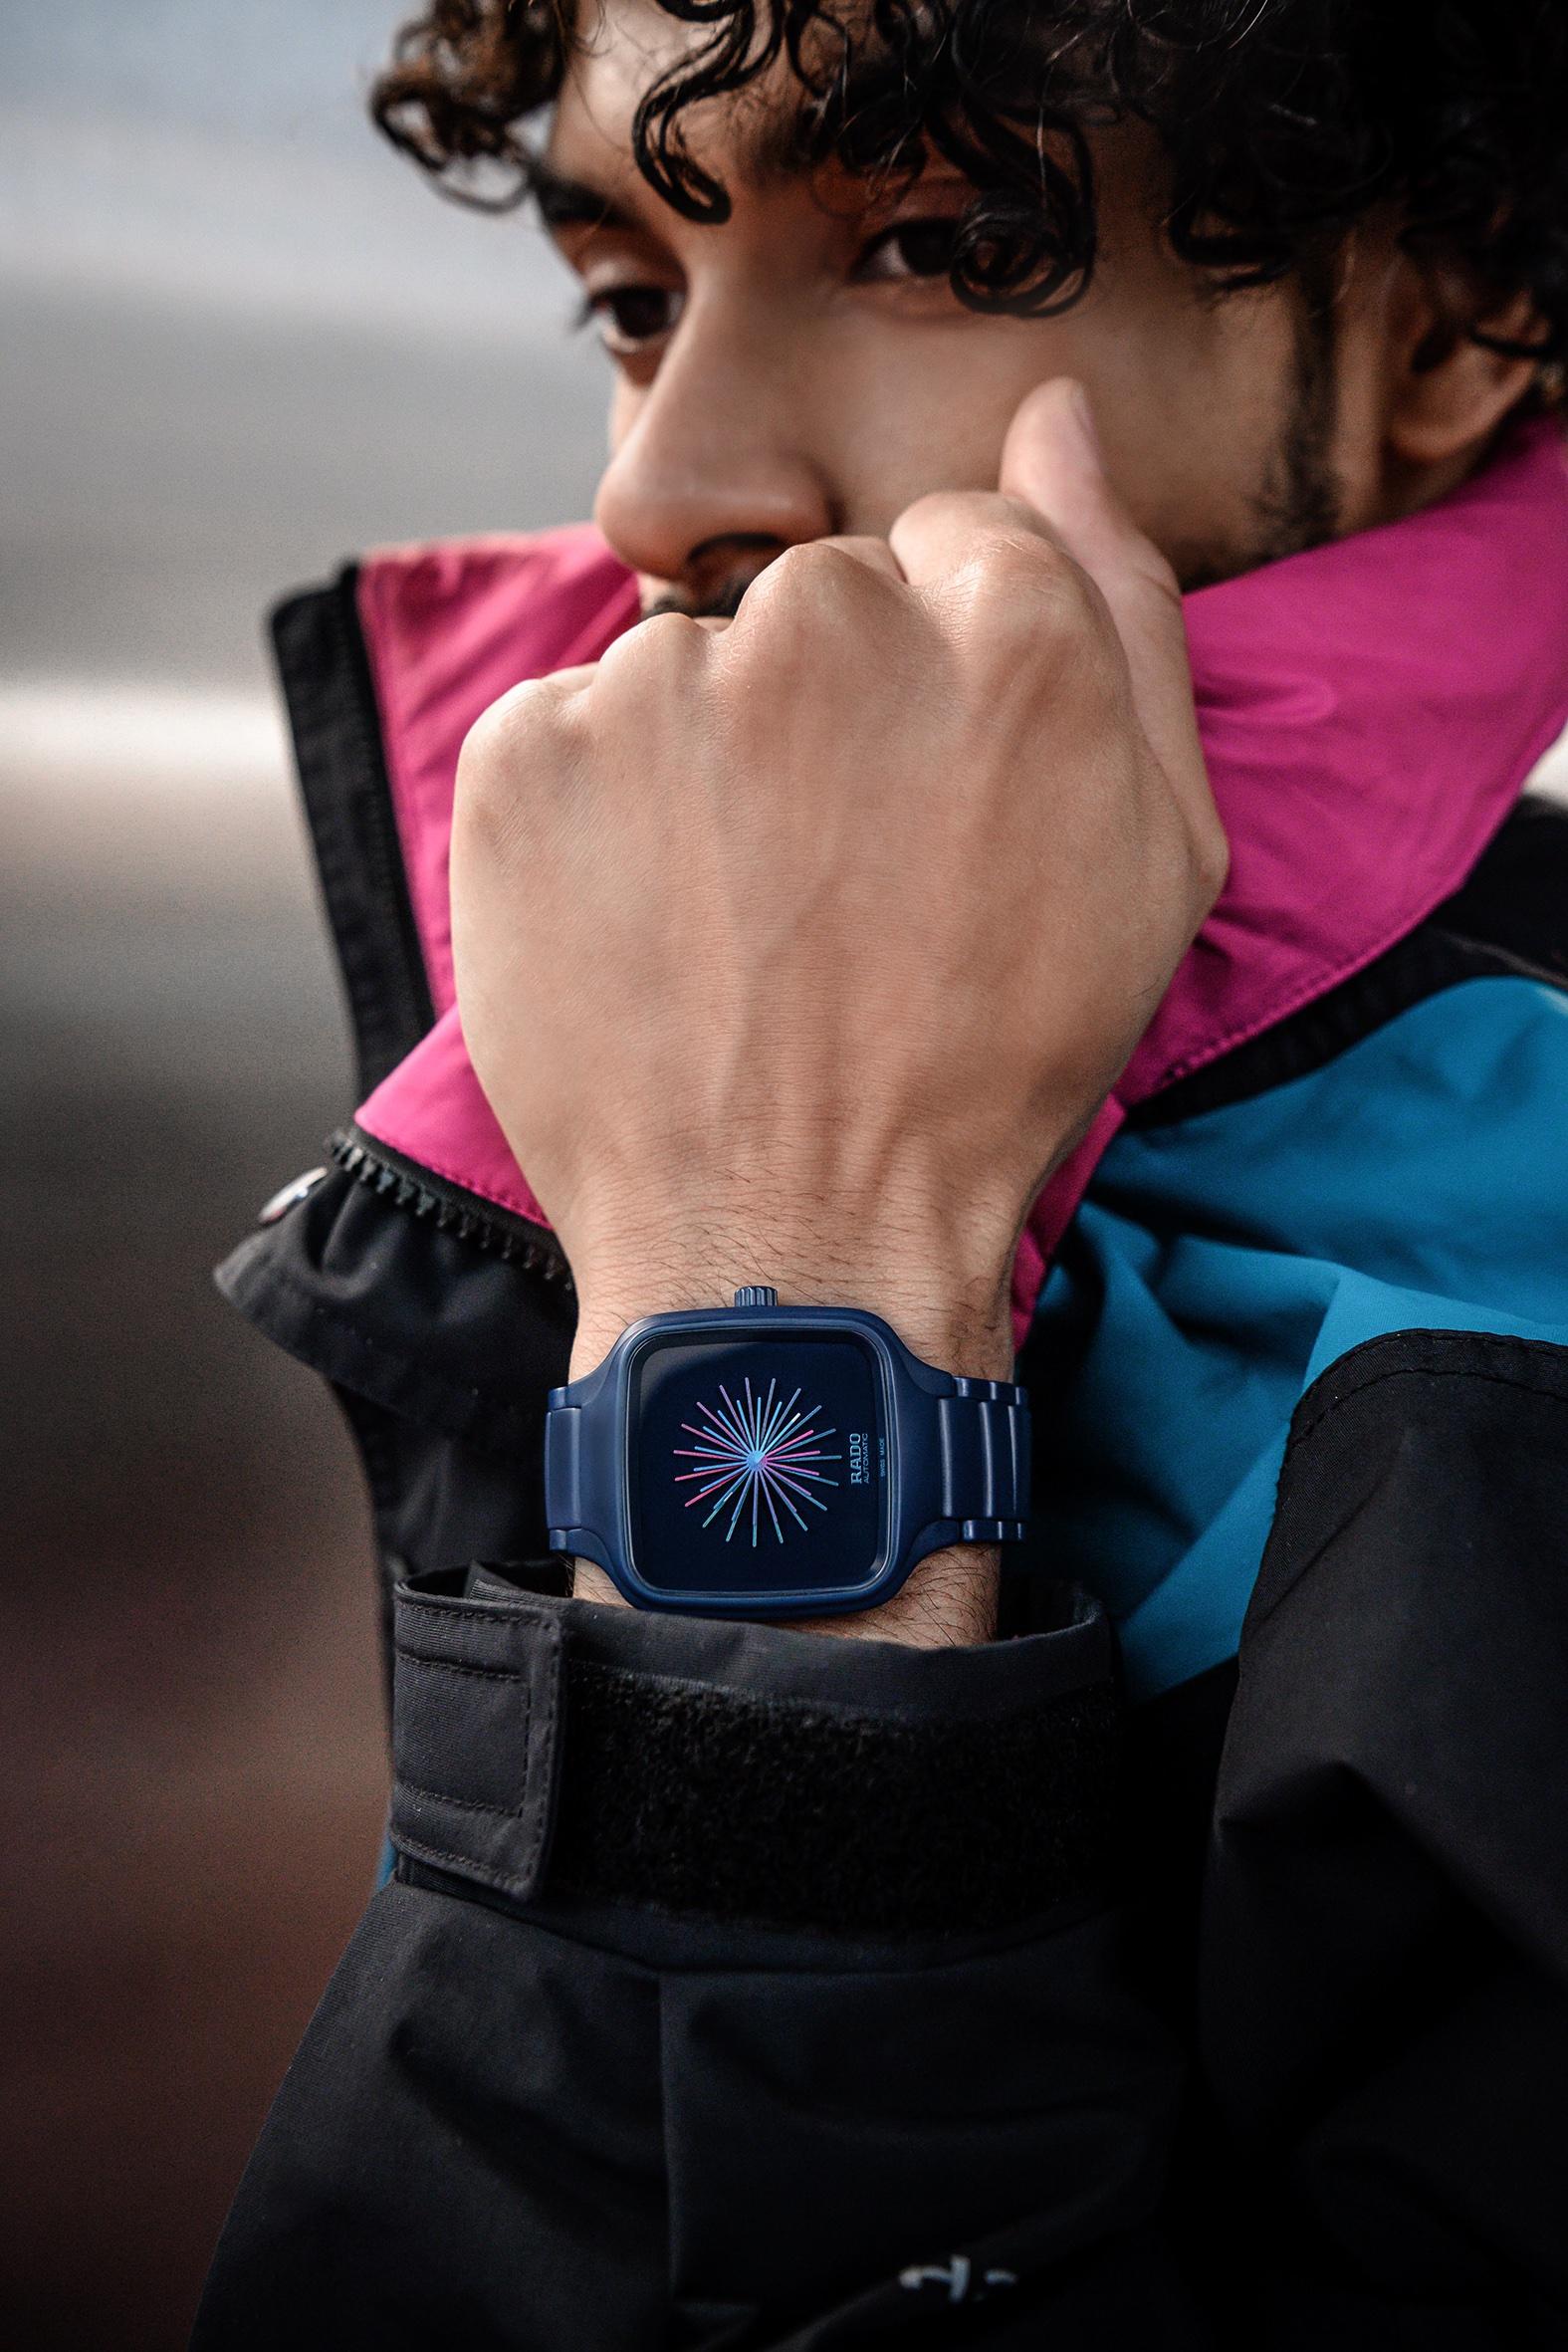 Rado瑞士雷达表True Square真我新生设计师款腕表上手图.jpg